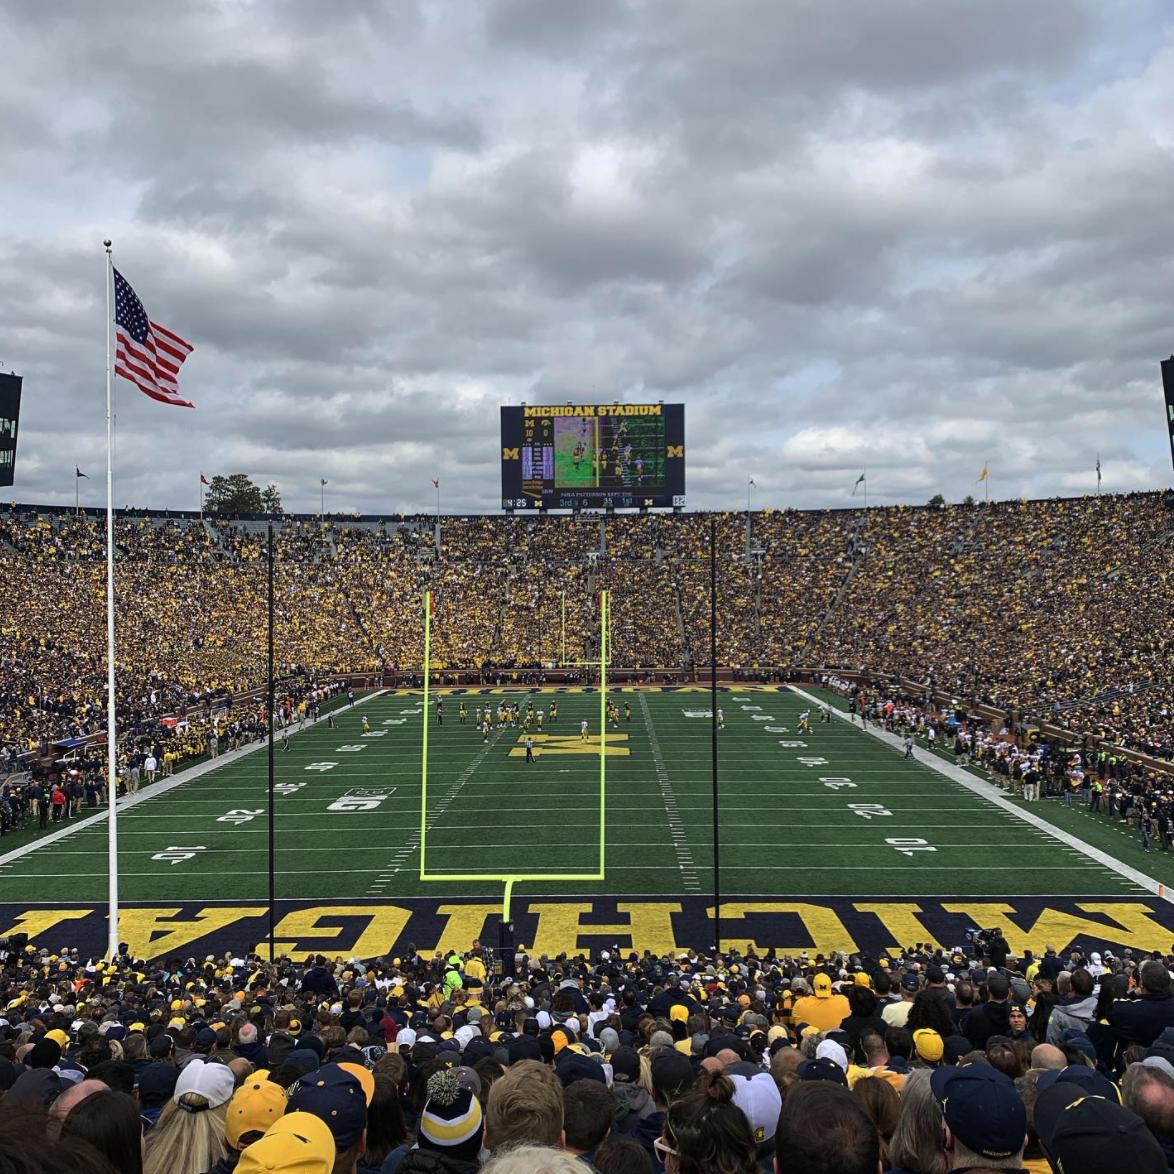 The Michigan Stadium